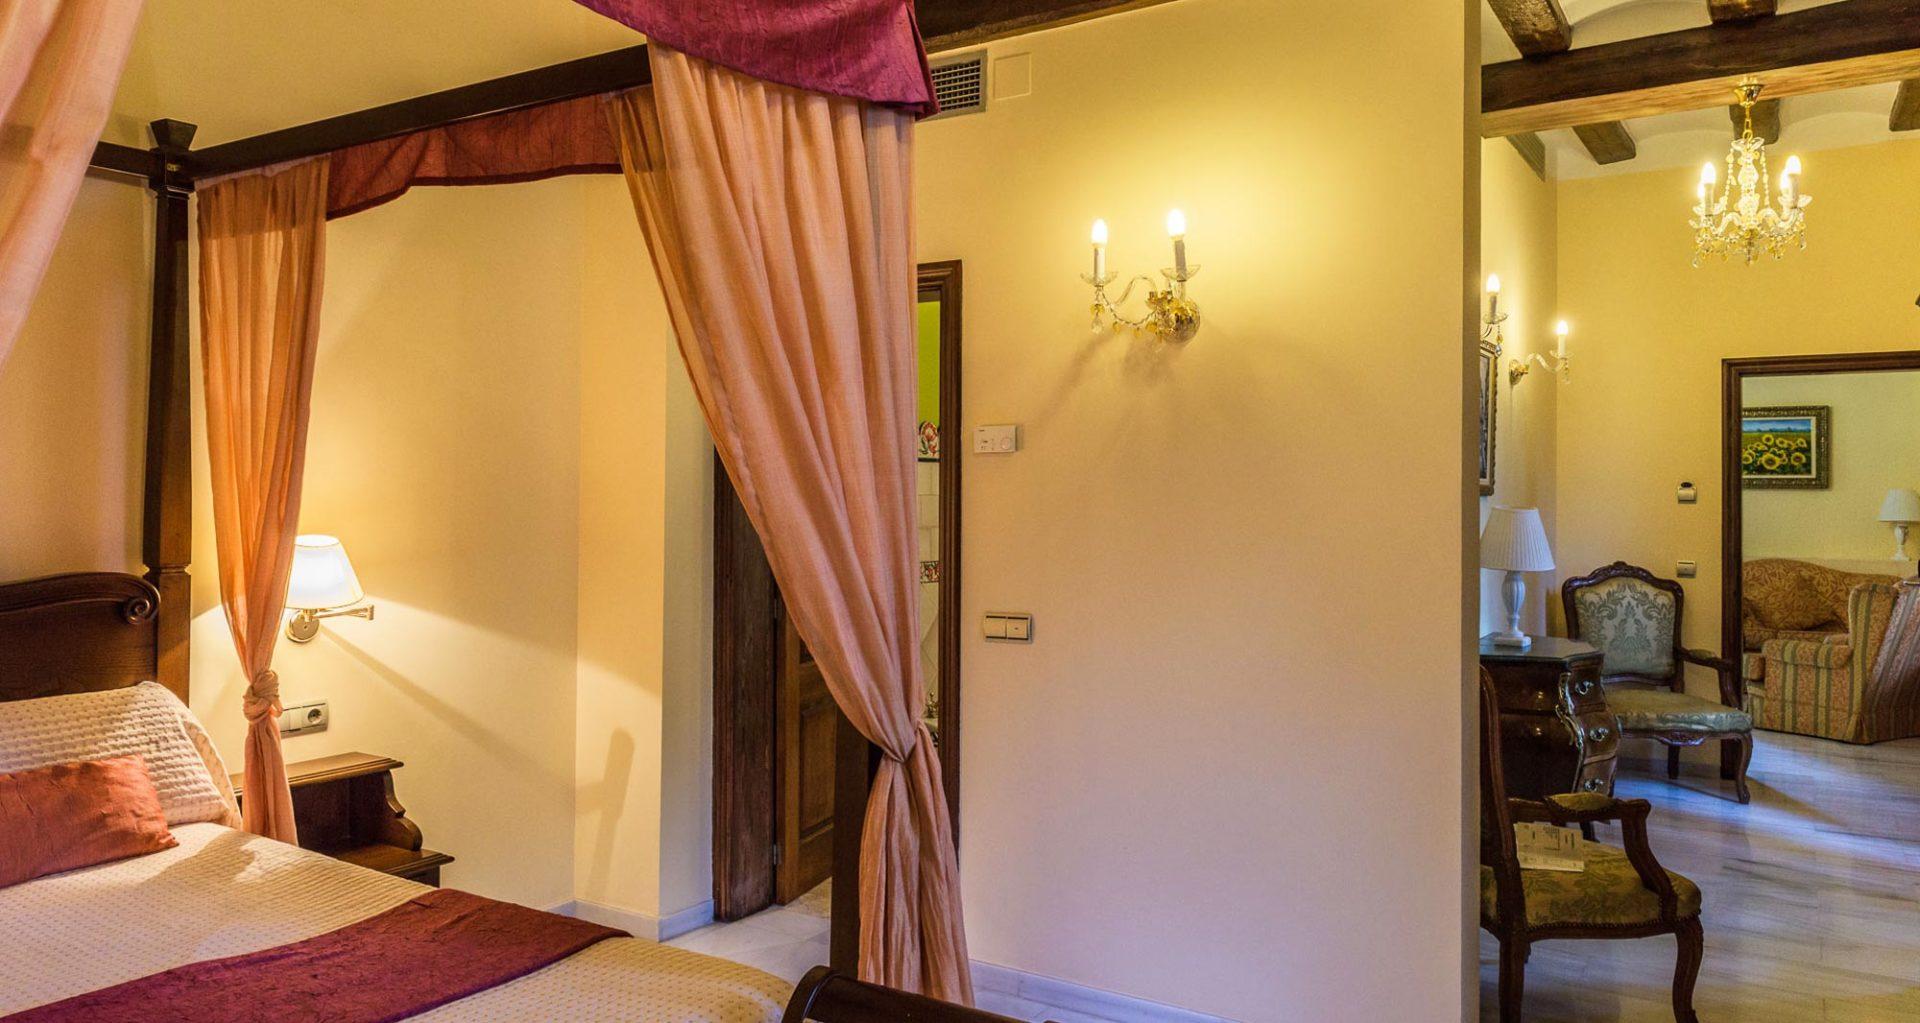 Hotel Villa Retiro Gran Suite habitacion doble